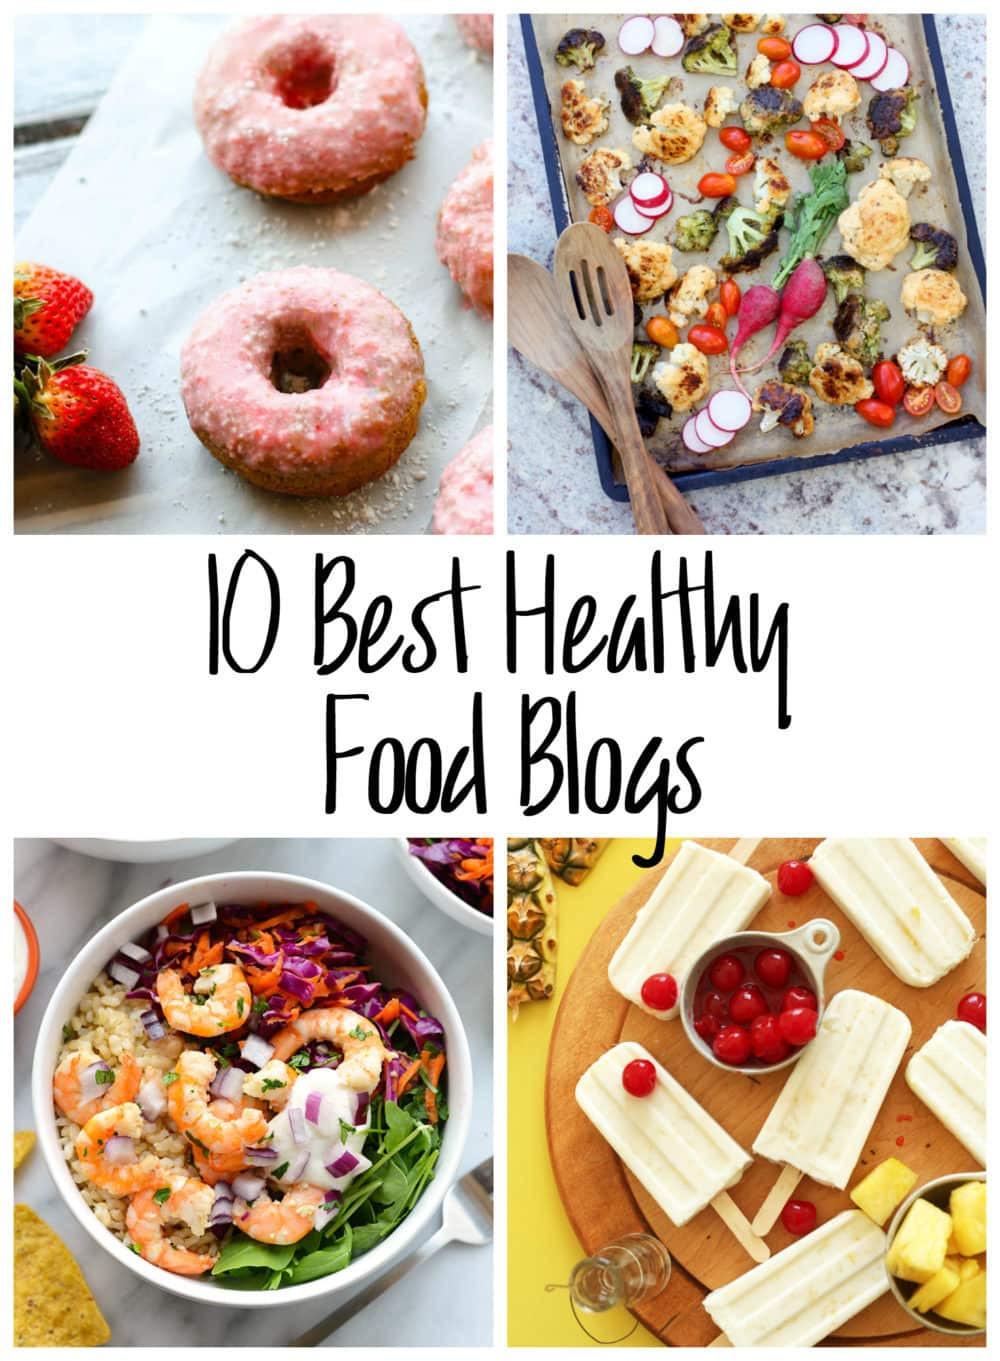 Top 10 Healthy Snacks  10 Best Healthy Food Blogs • The Fit Cookie